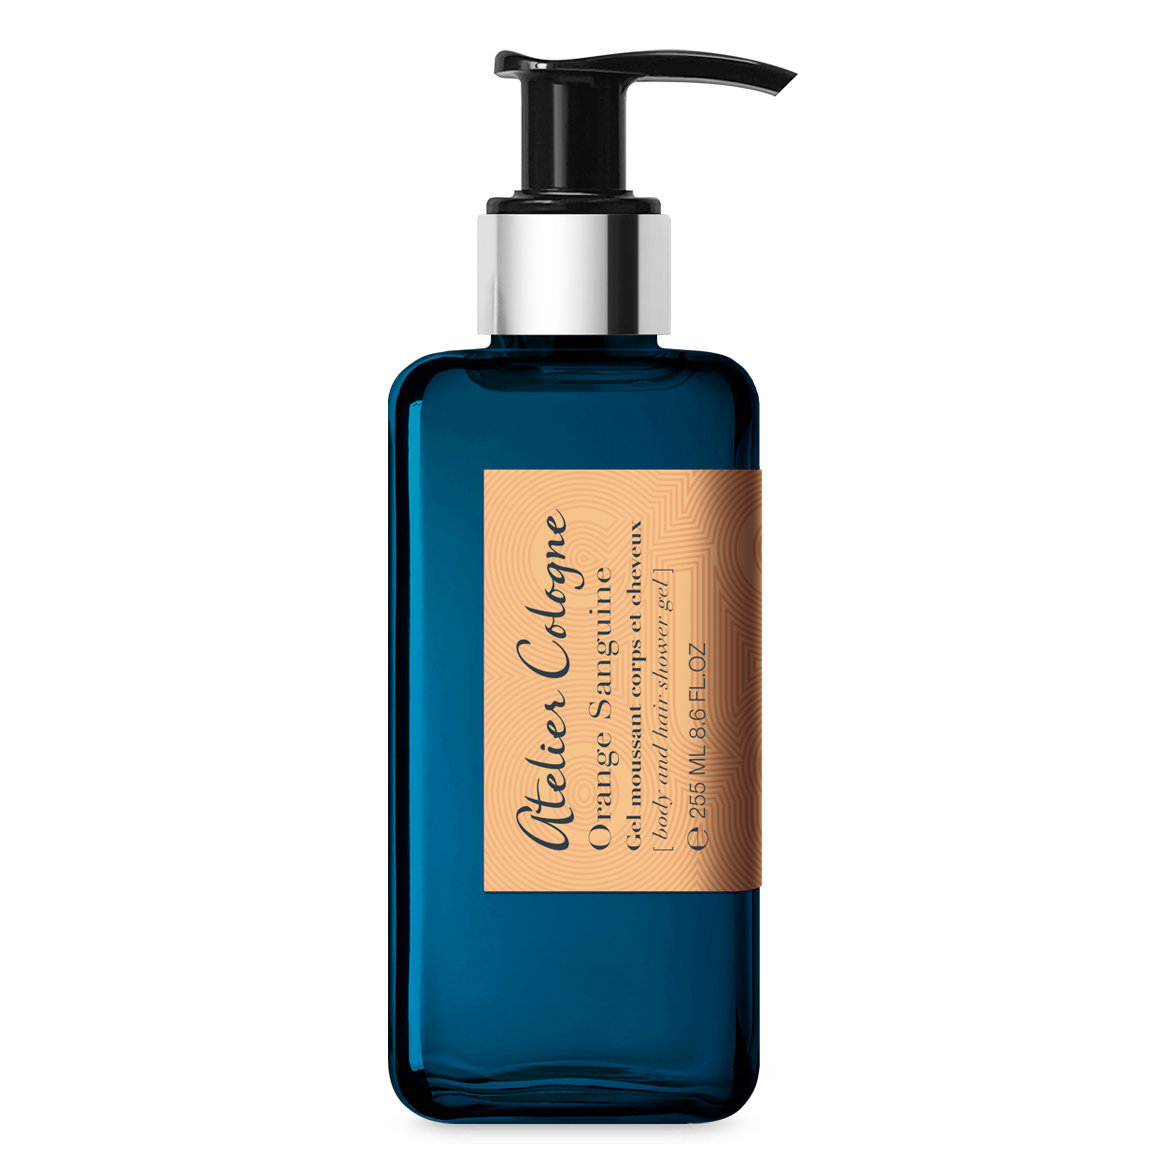 Atelier Cologne Orange Sanguine Body & Hair Shower Gel alternative view 1 - product swatch.